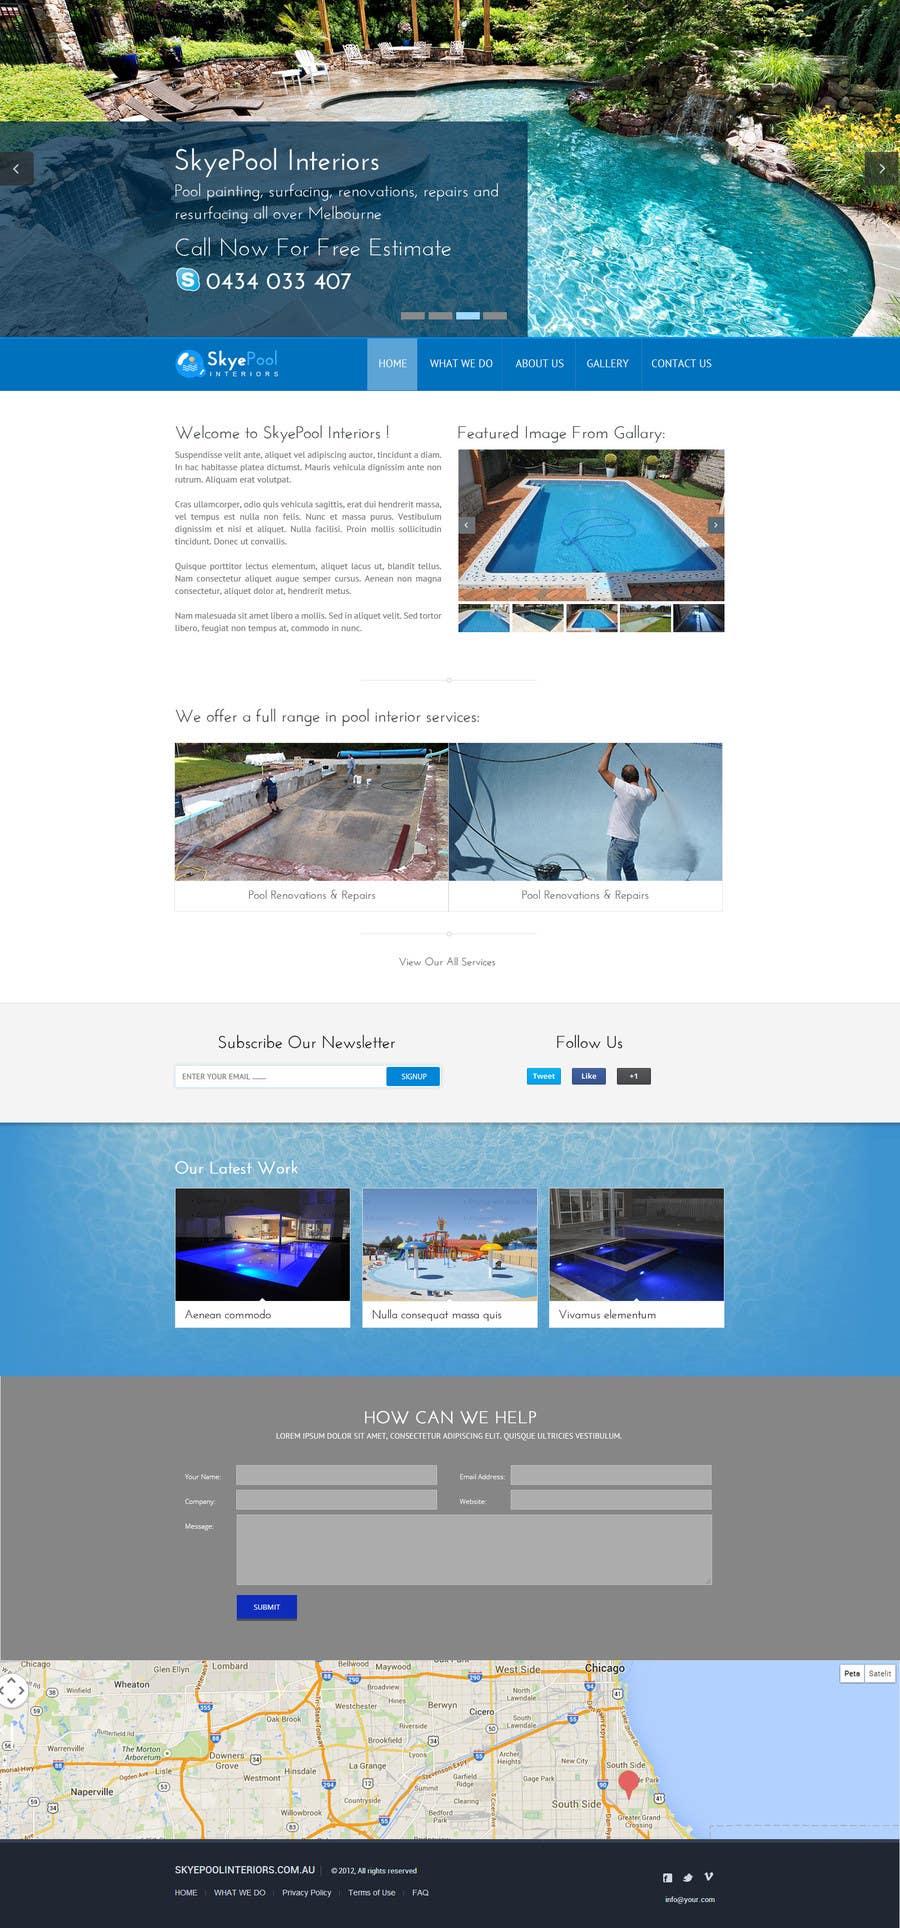 Bài tham dự cuộc thi #                                        41                                      cho                                         Design a Website Mockup/Including Logo for Pool Renovation company